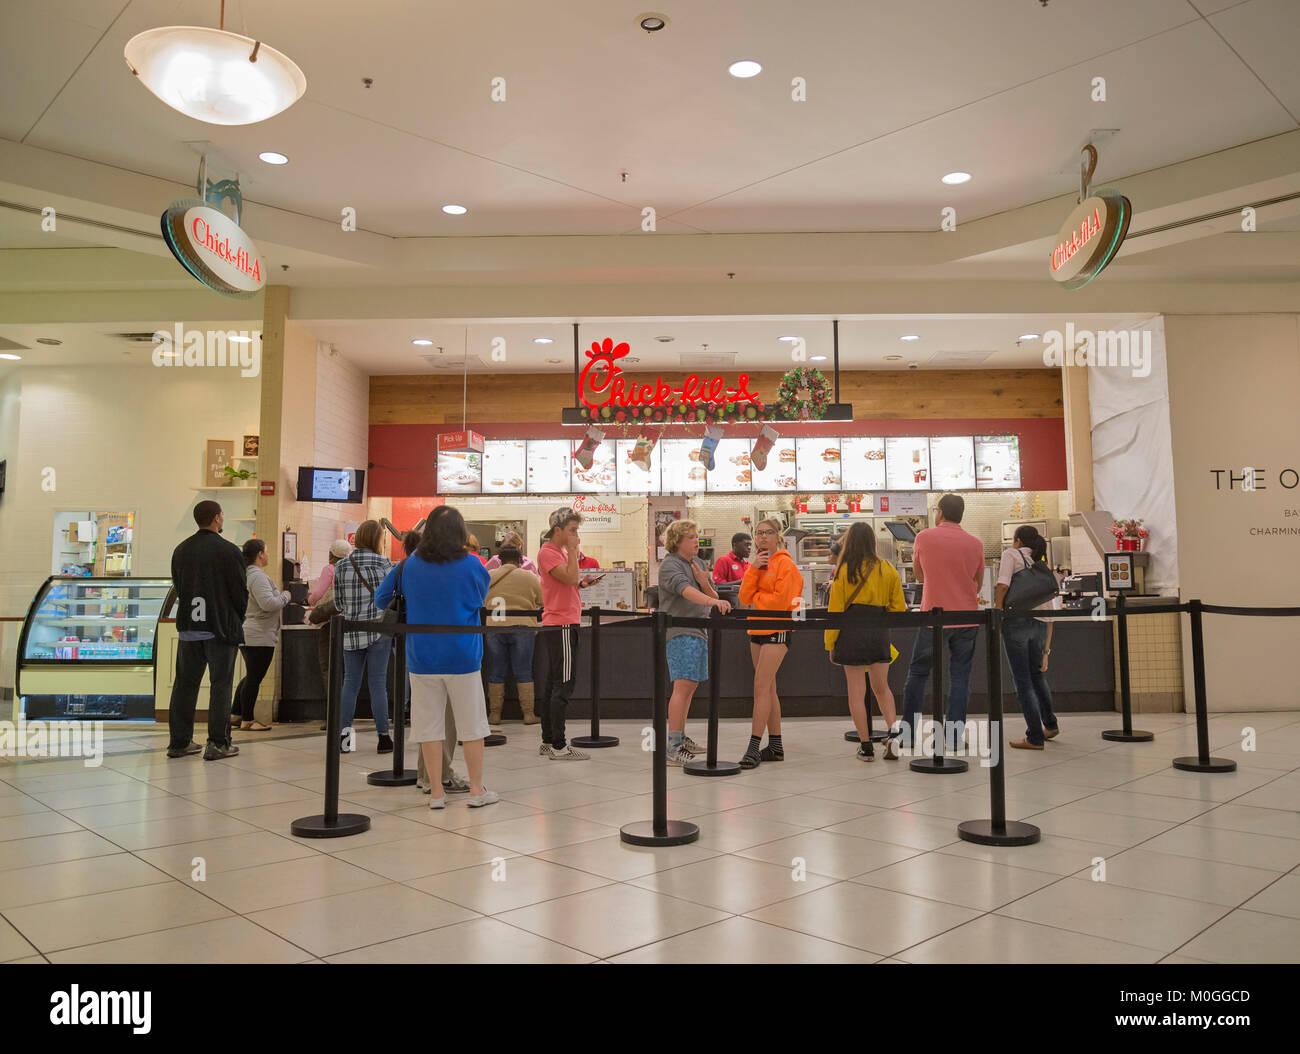 Oaks mall food court